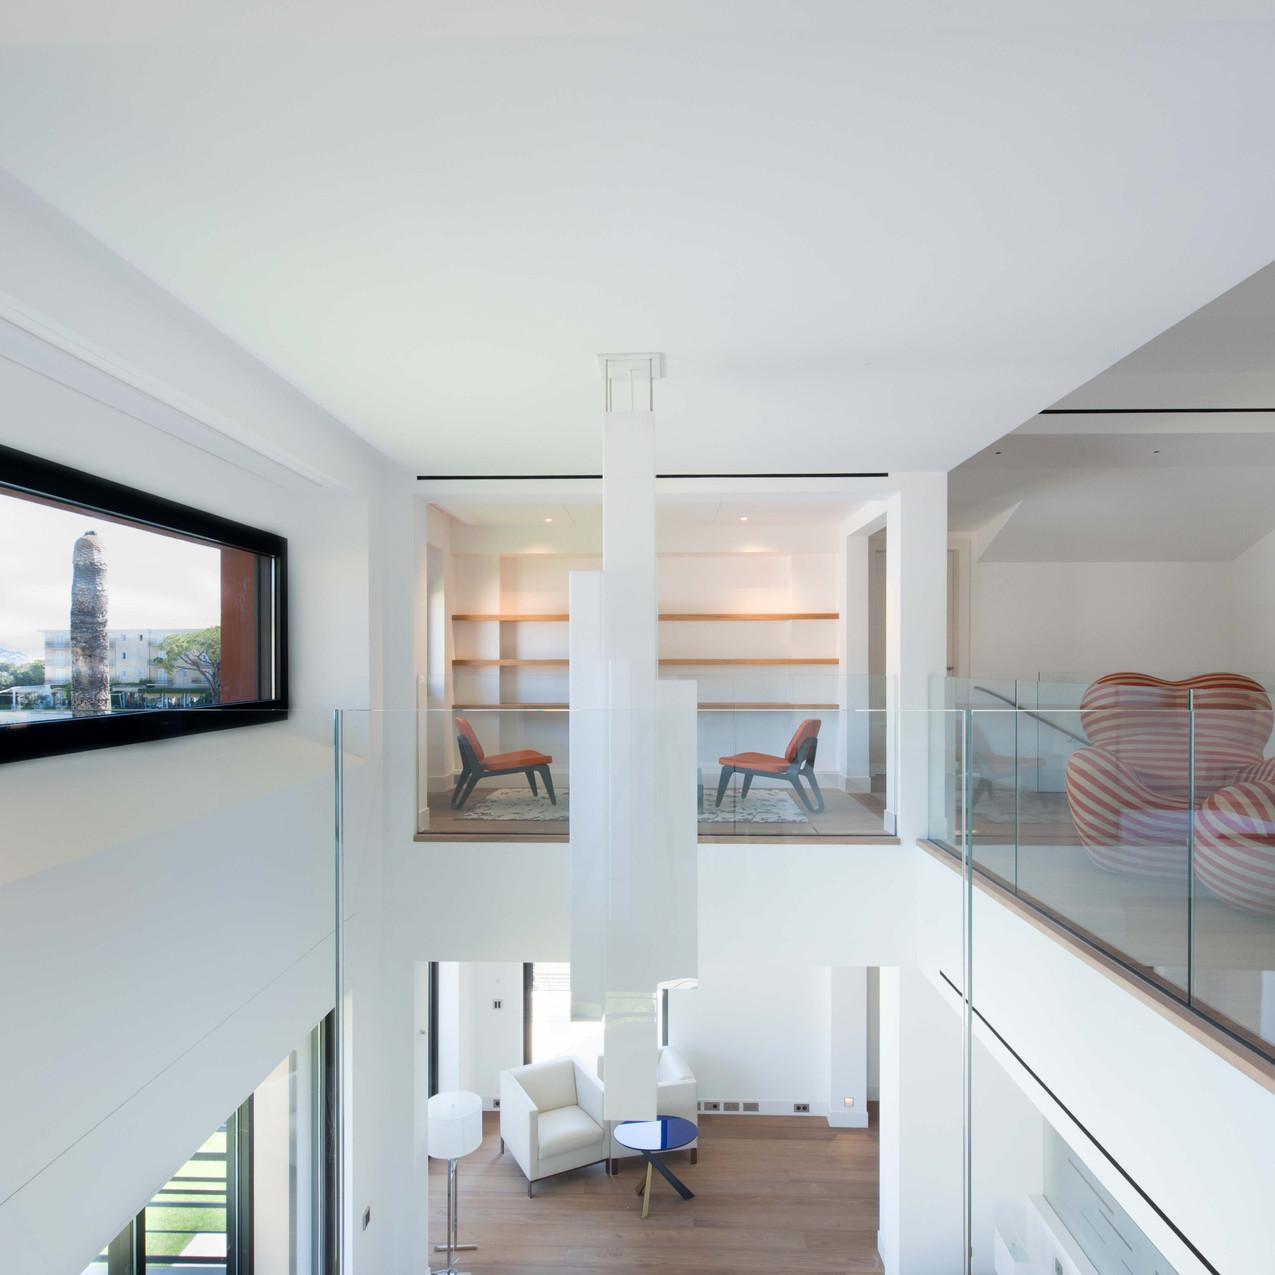 photographe architecture nice france french riviera paca cote dazur interieur-37